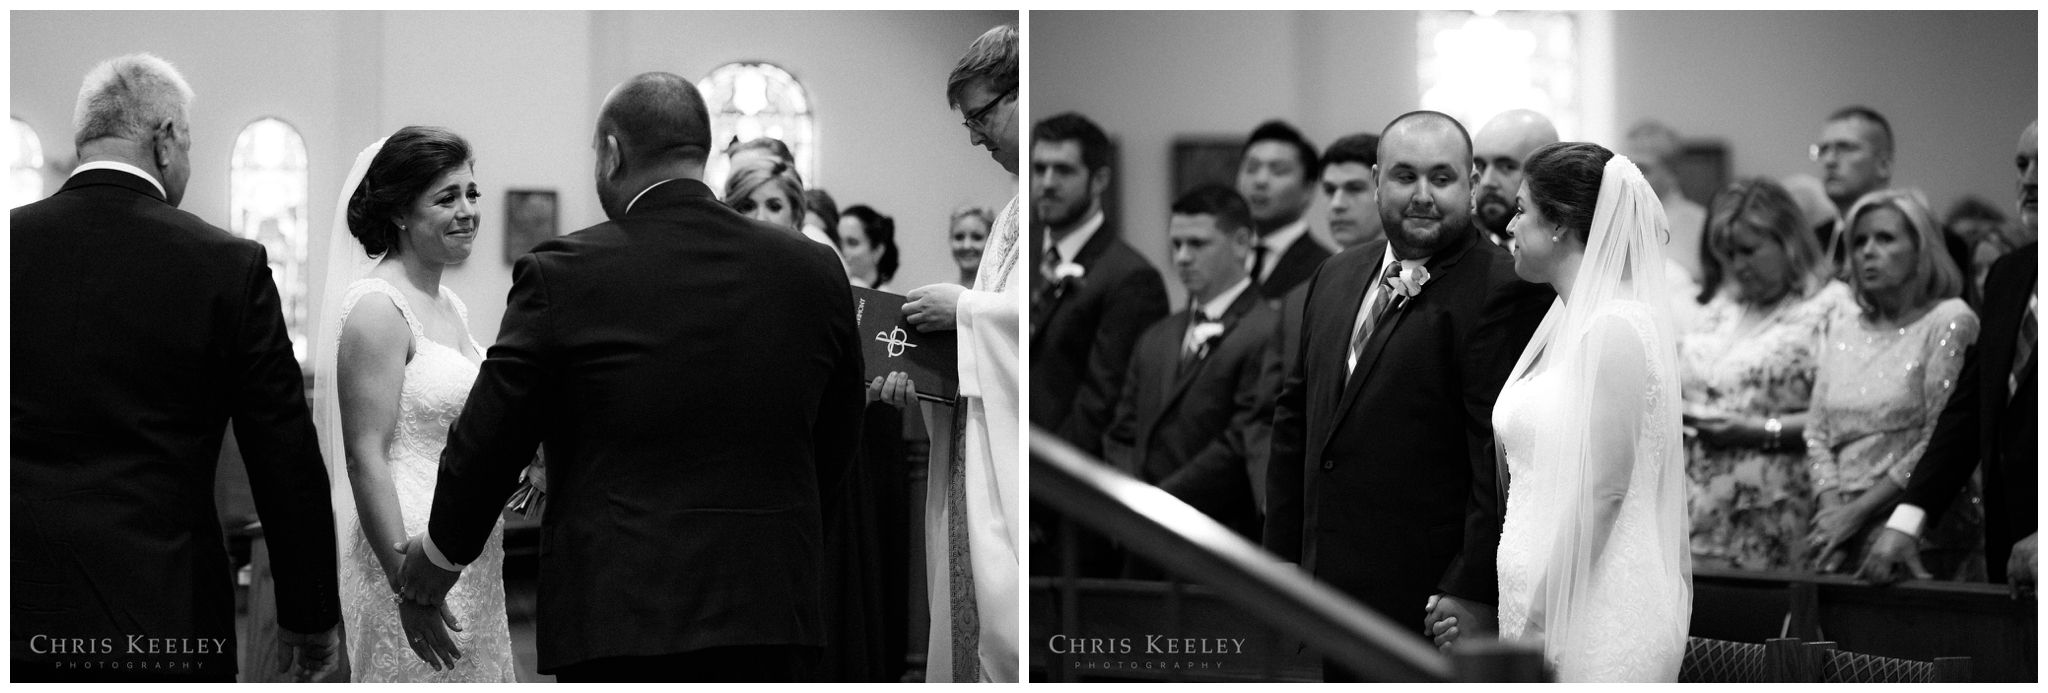 burrows-new-hampshire-wedding-photographer-chris-keeley-28.jpg